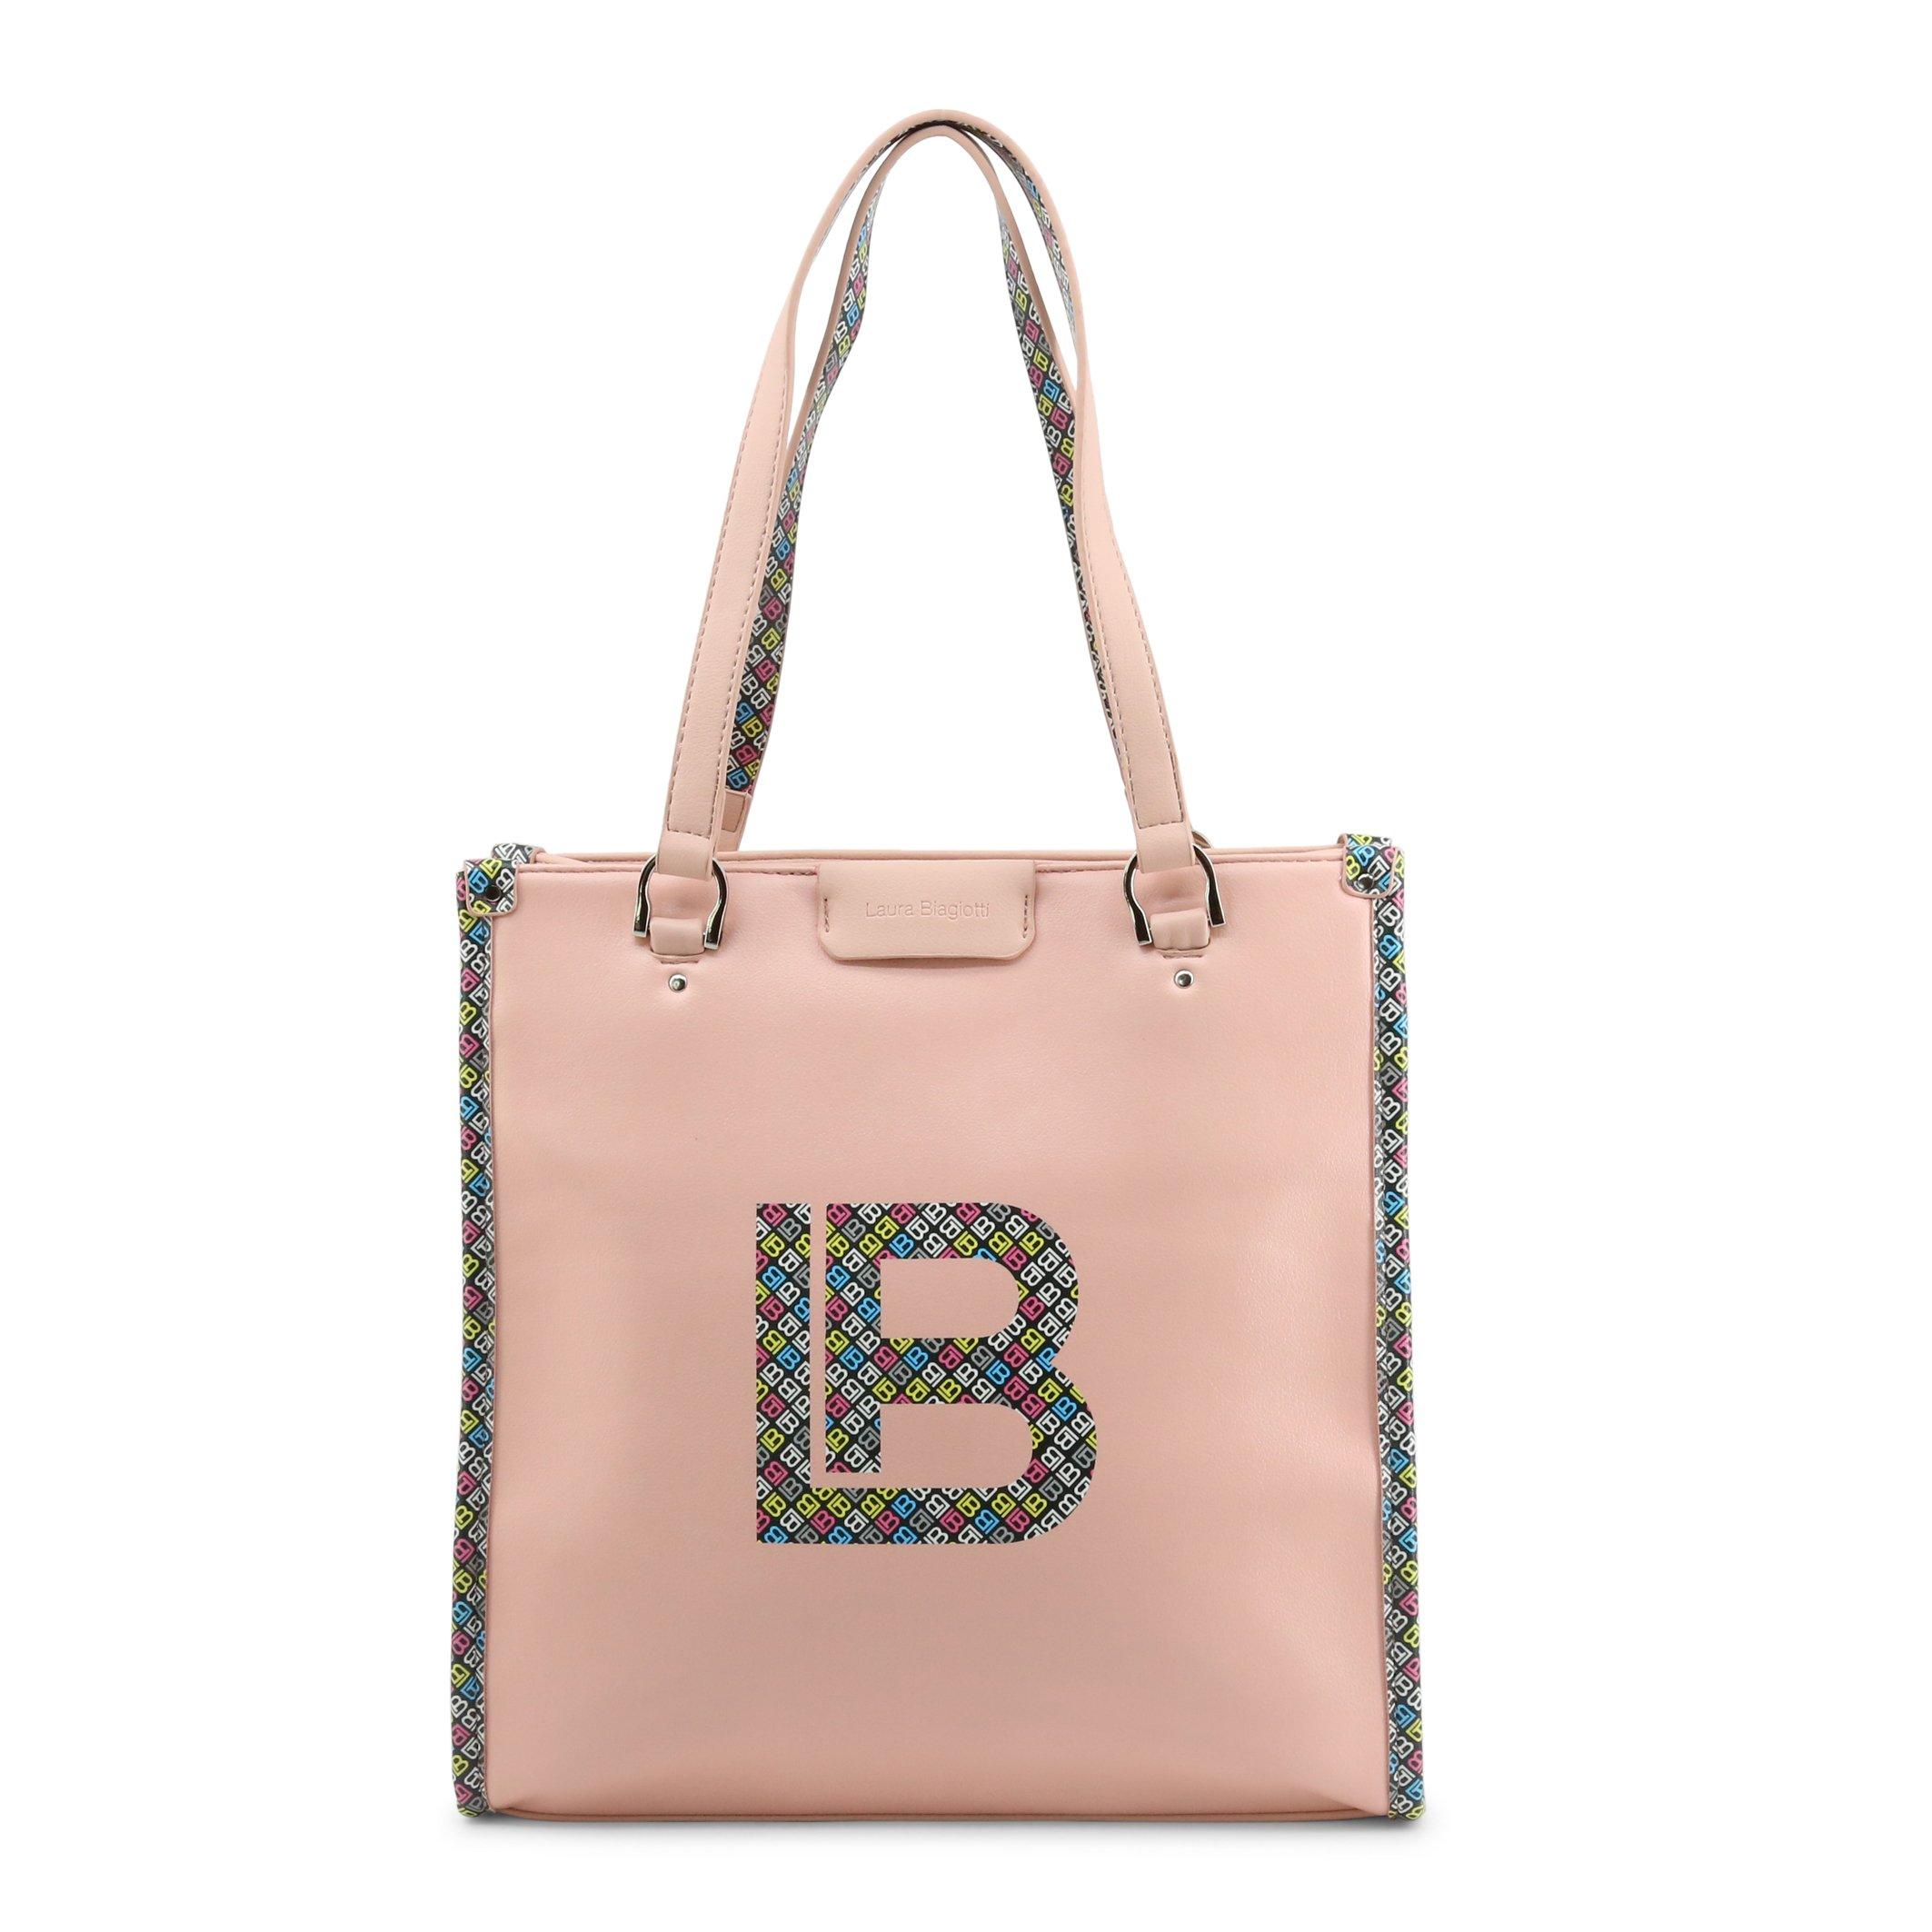 Laura Biagiotti Women's Shoulder Bag Various Colours Milla_108-1 - pink NOSIZE